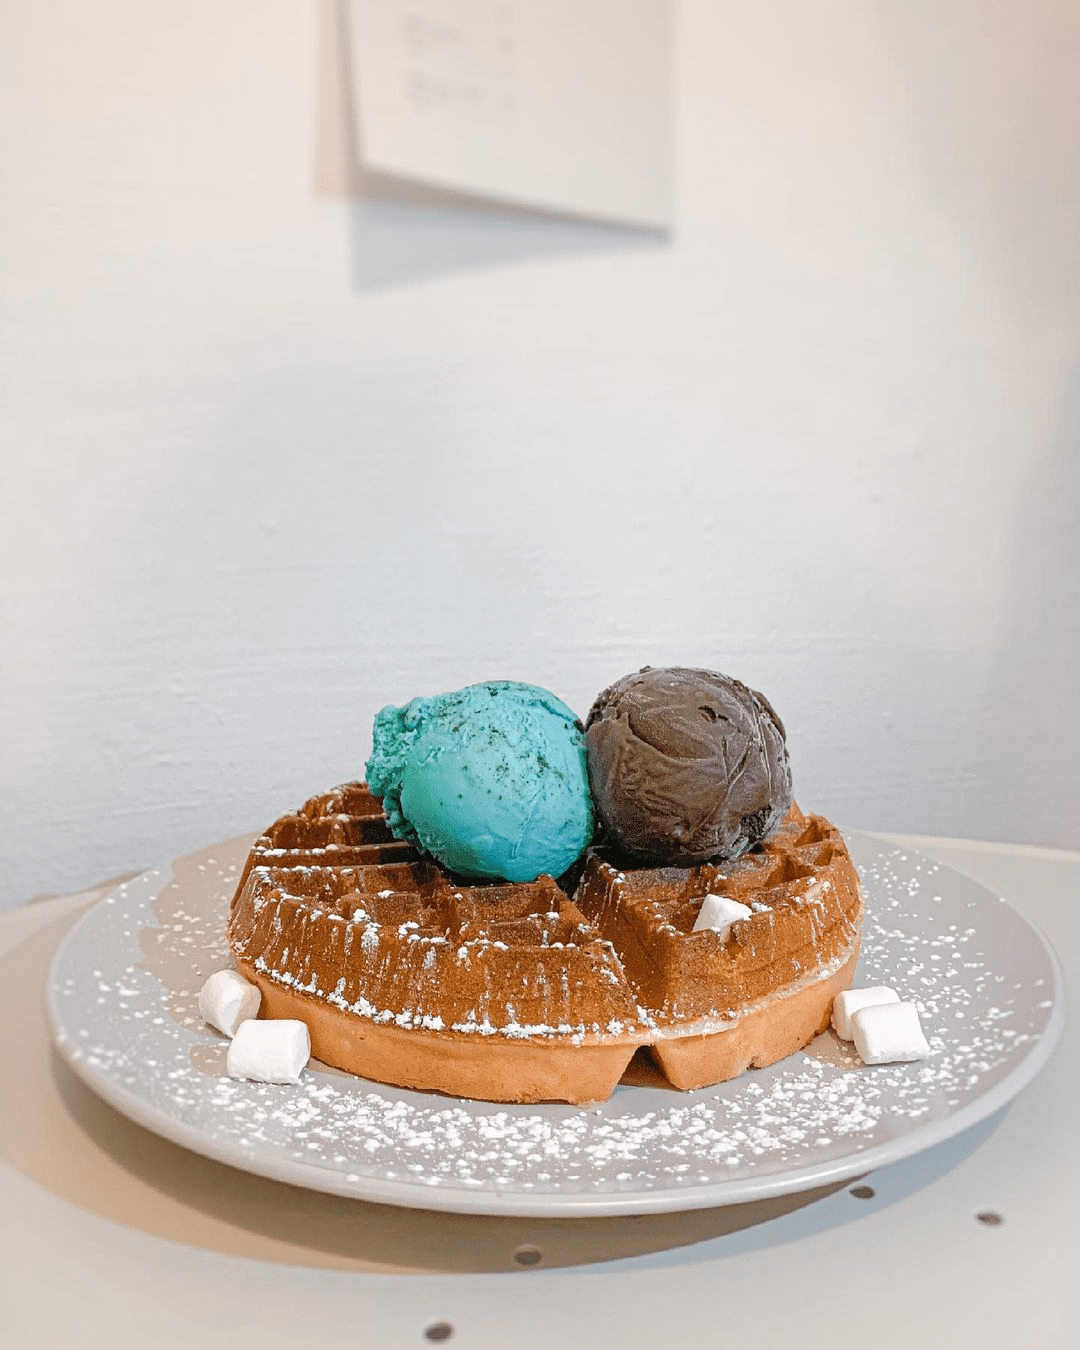 New Cafes And Restaurants June 2021 - Around Ice Cream